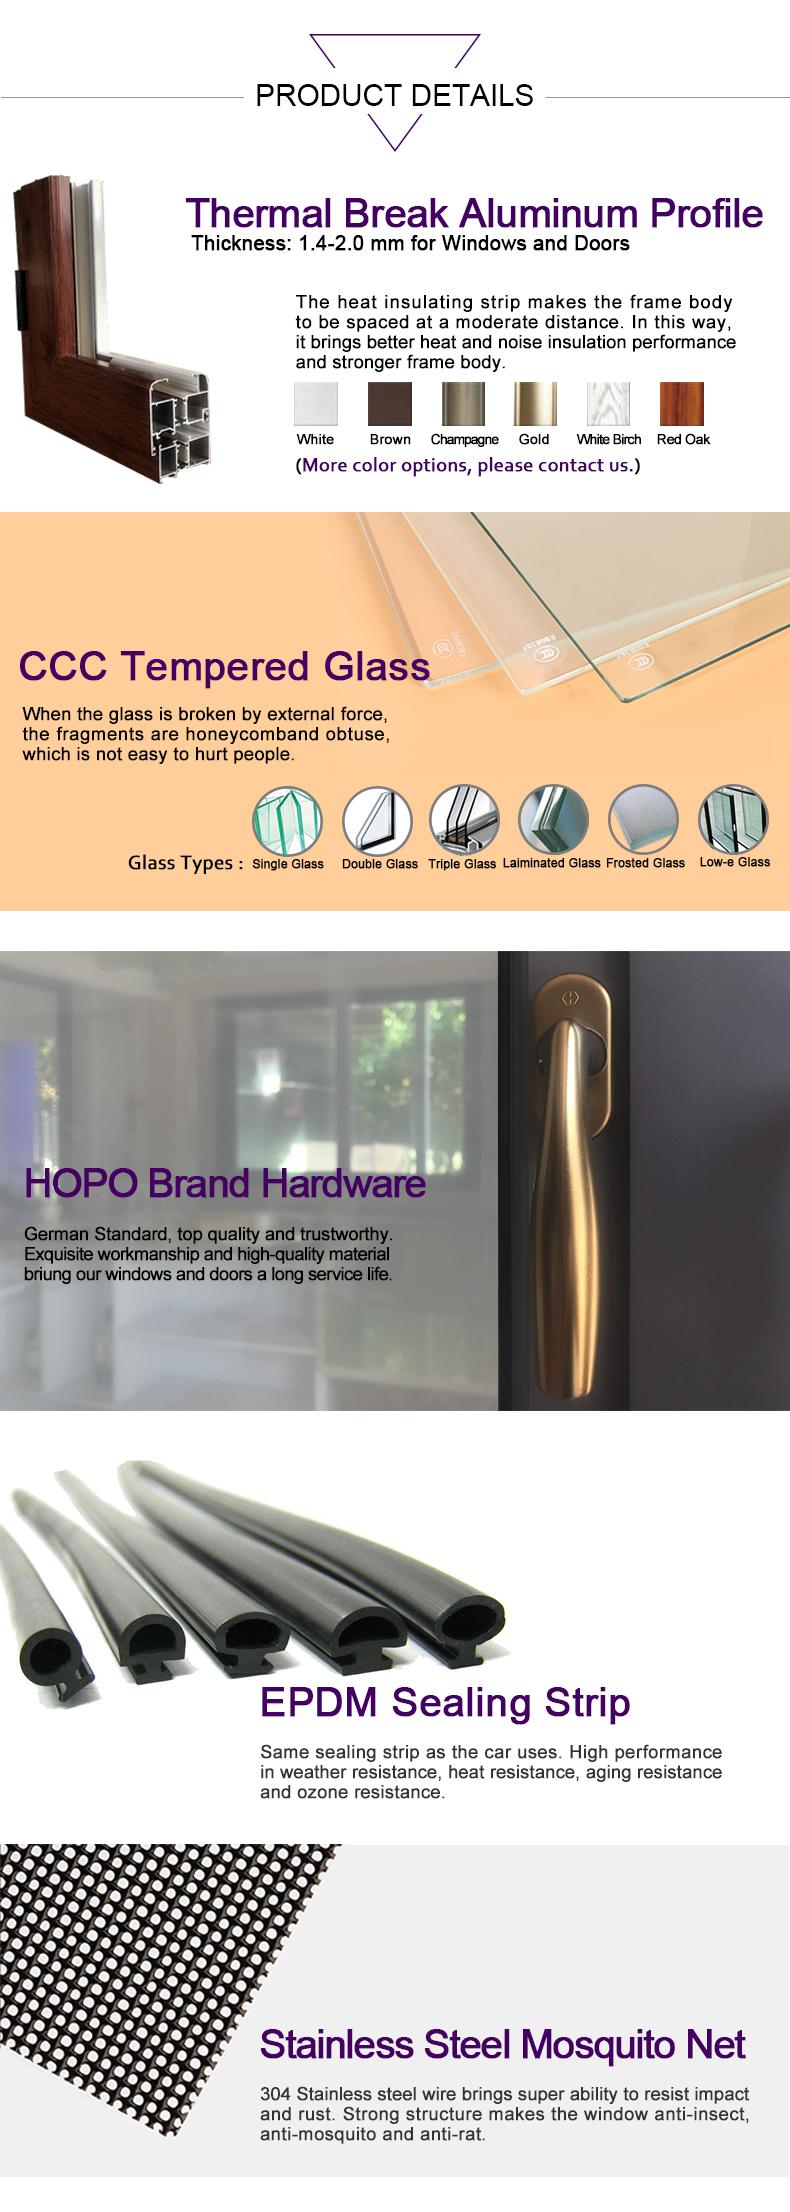 3 Product Details